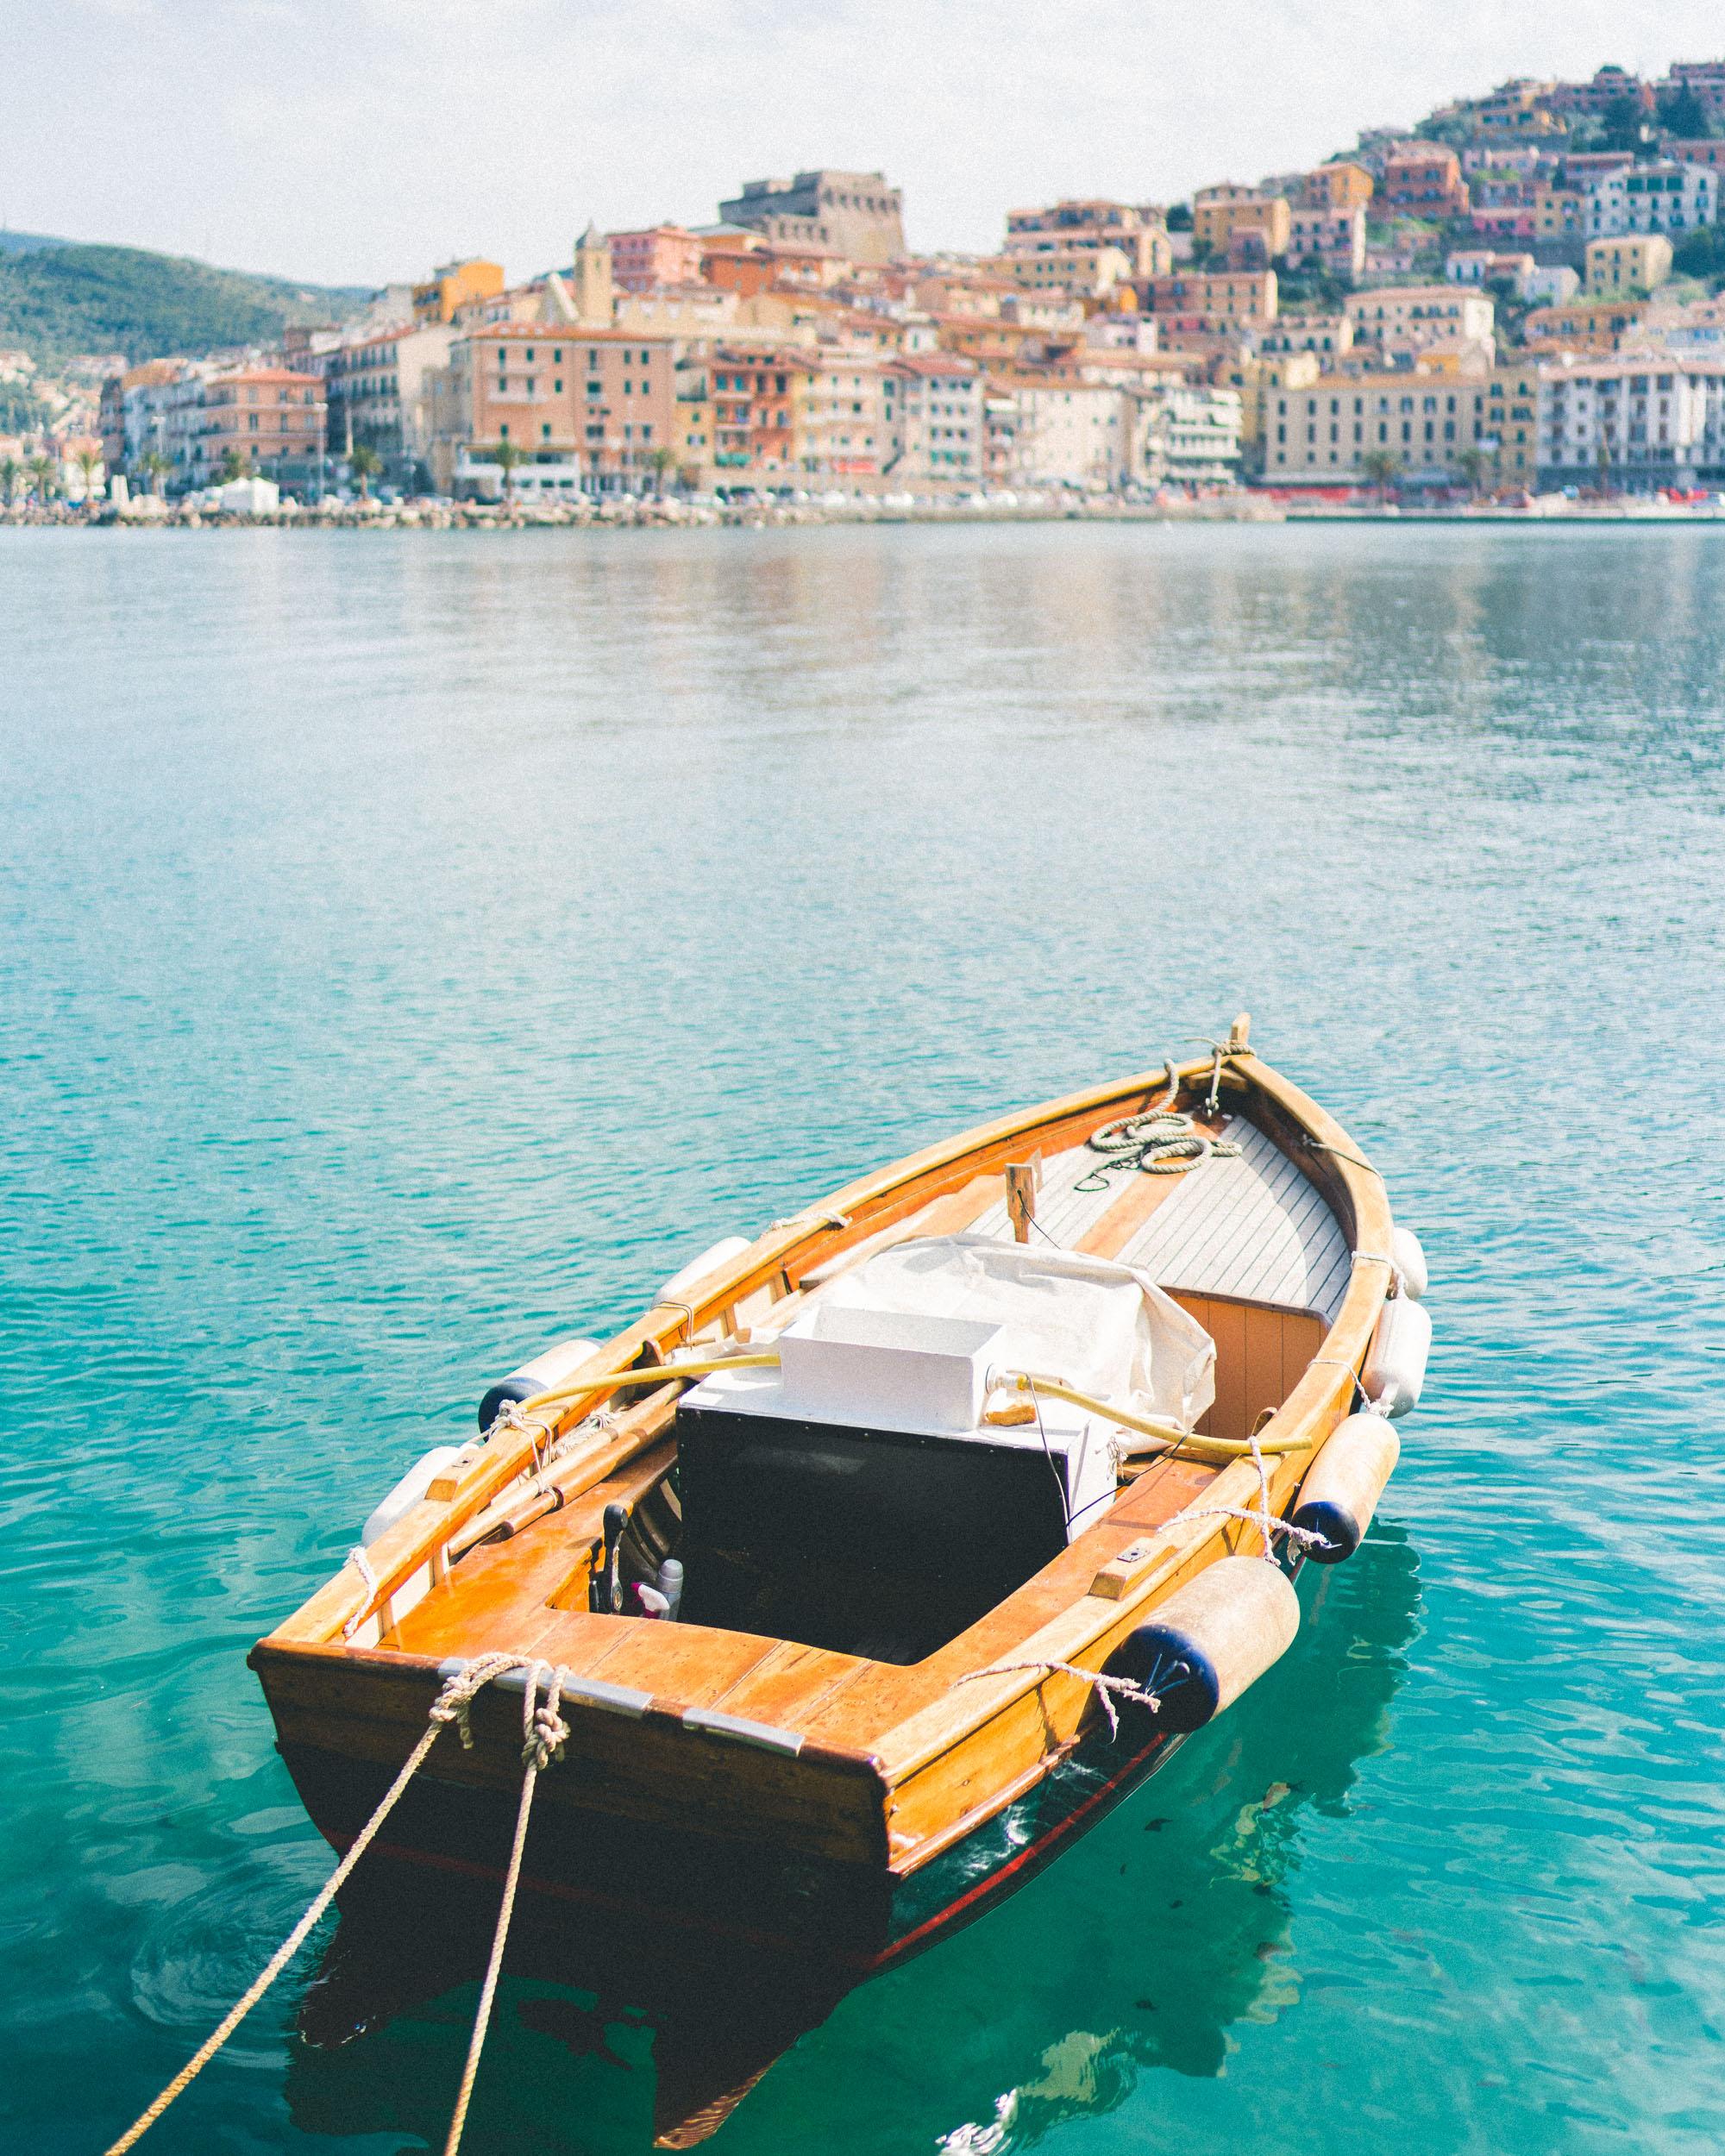 Views of Porto Santo Stefano seaside italian town, southern Tuscany, Italy